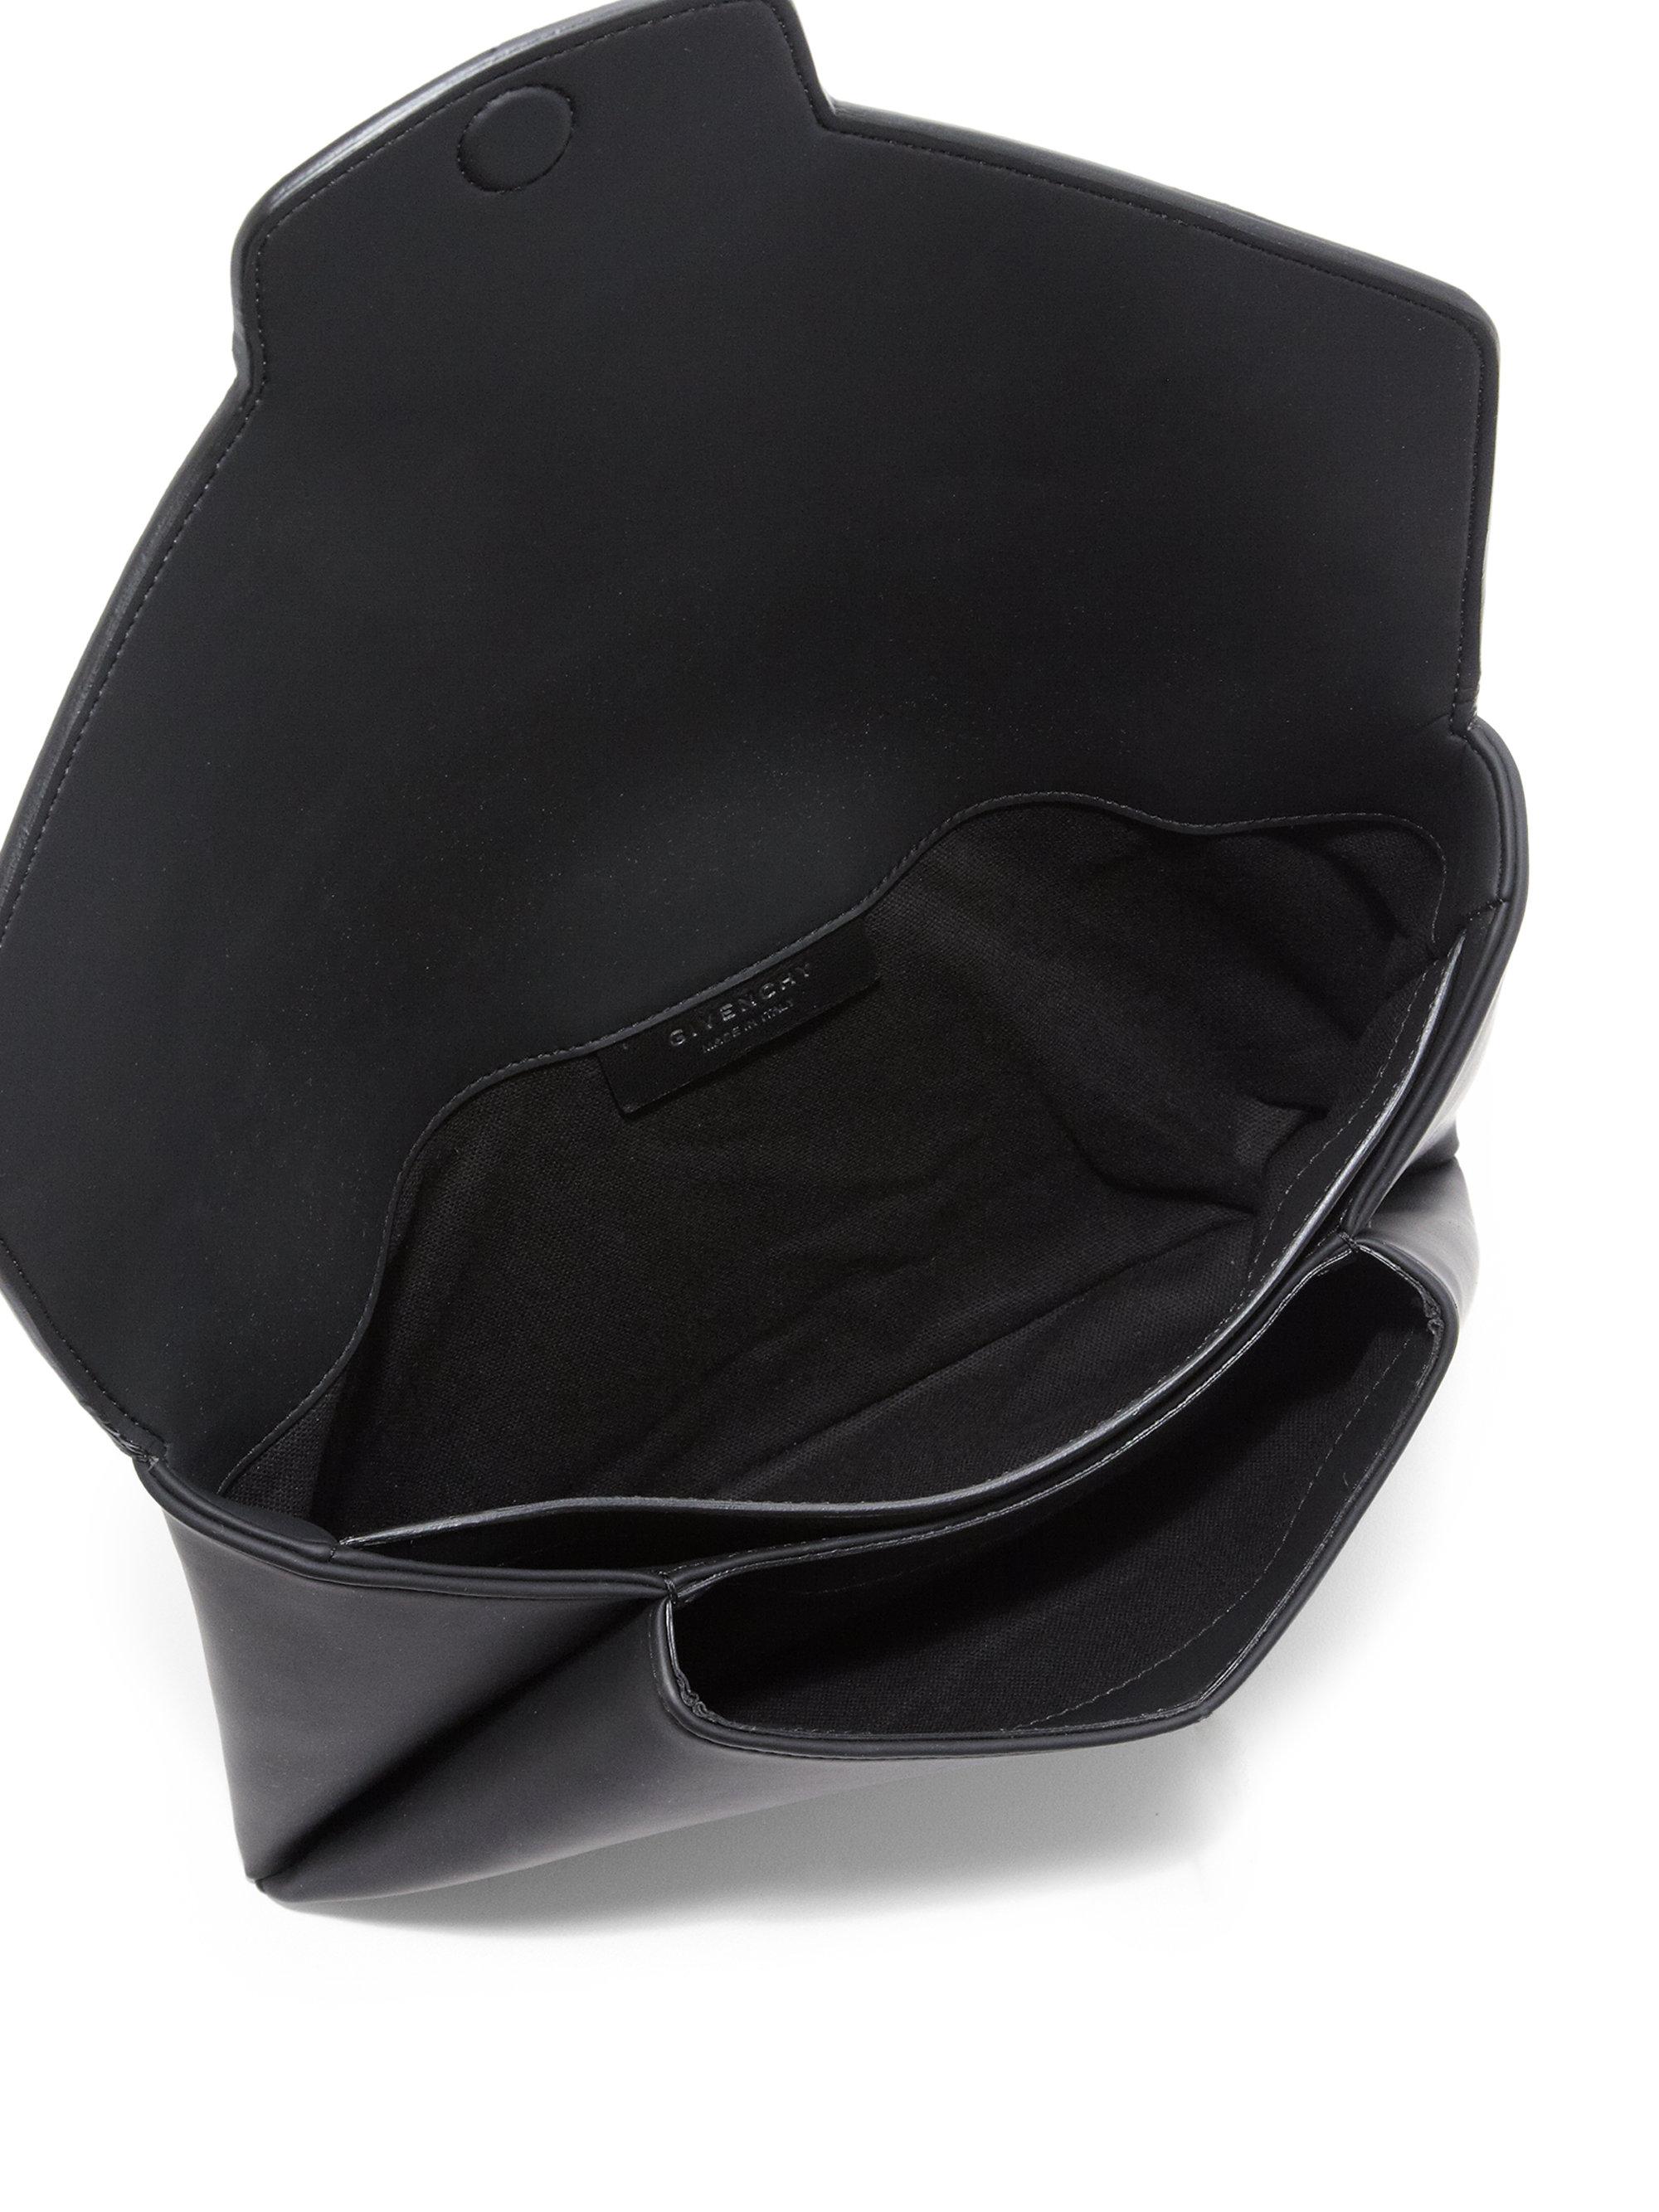 97cfe76d544 Givenchy Antigona Medium Faux-leather Envelope Clutch in Black - Lyst